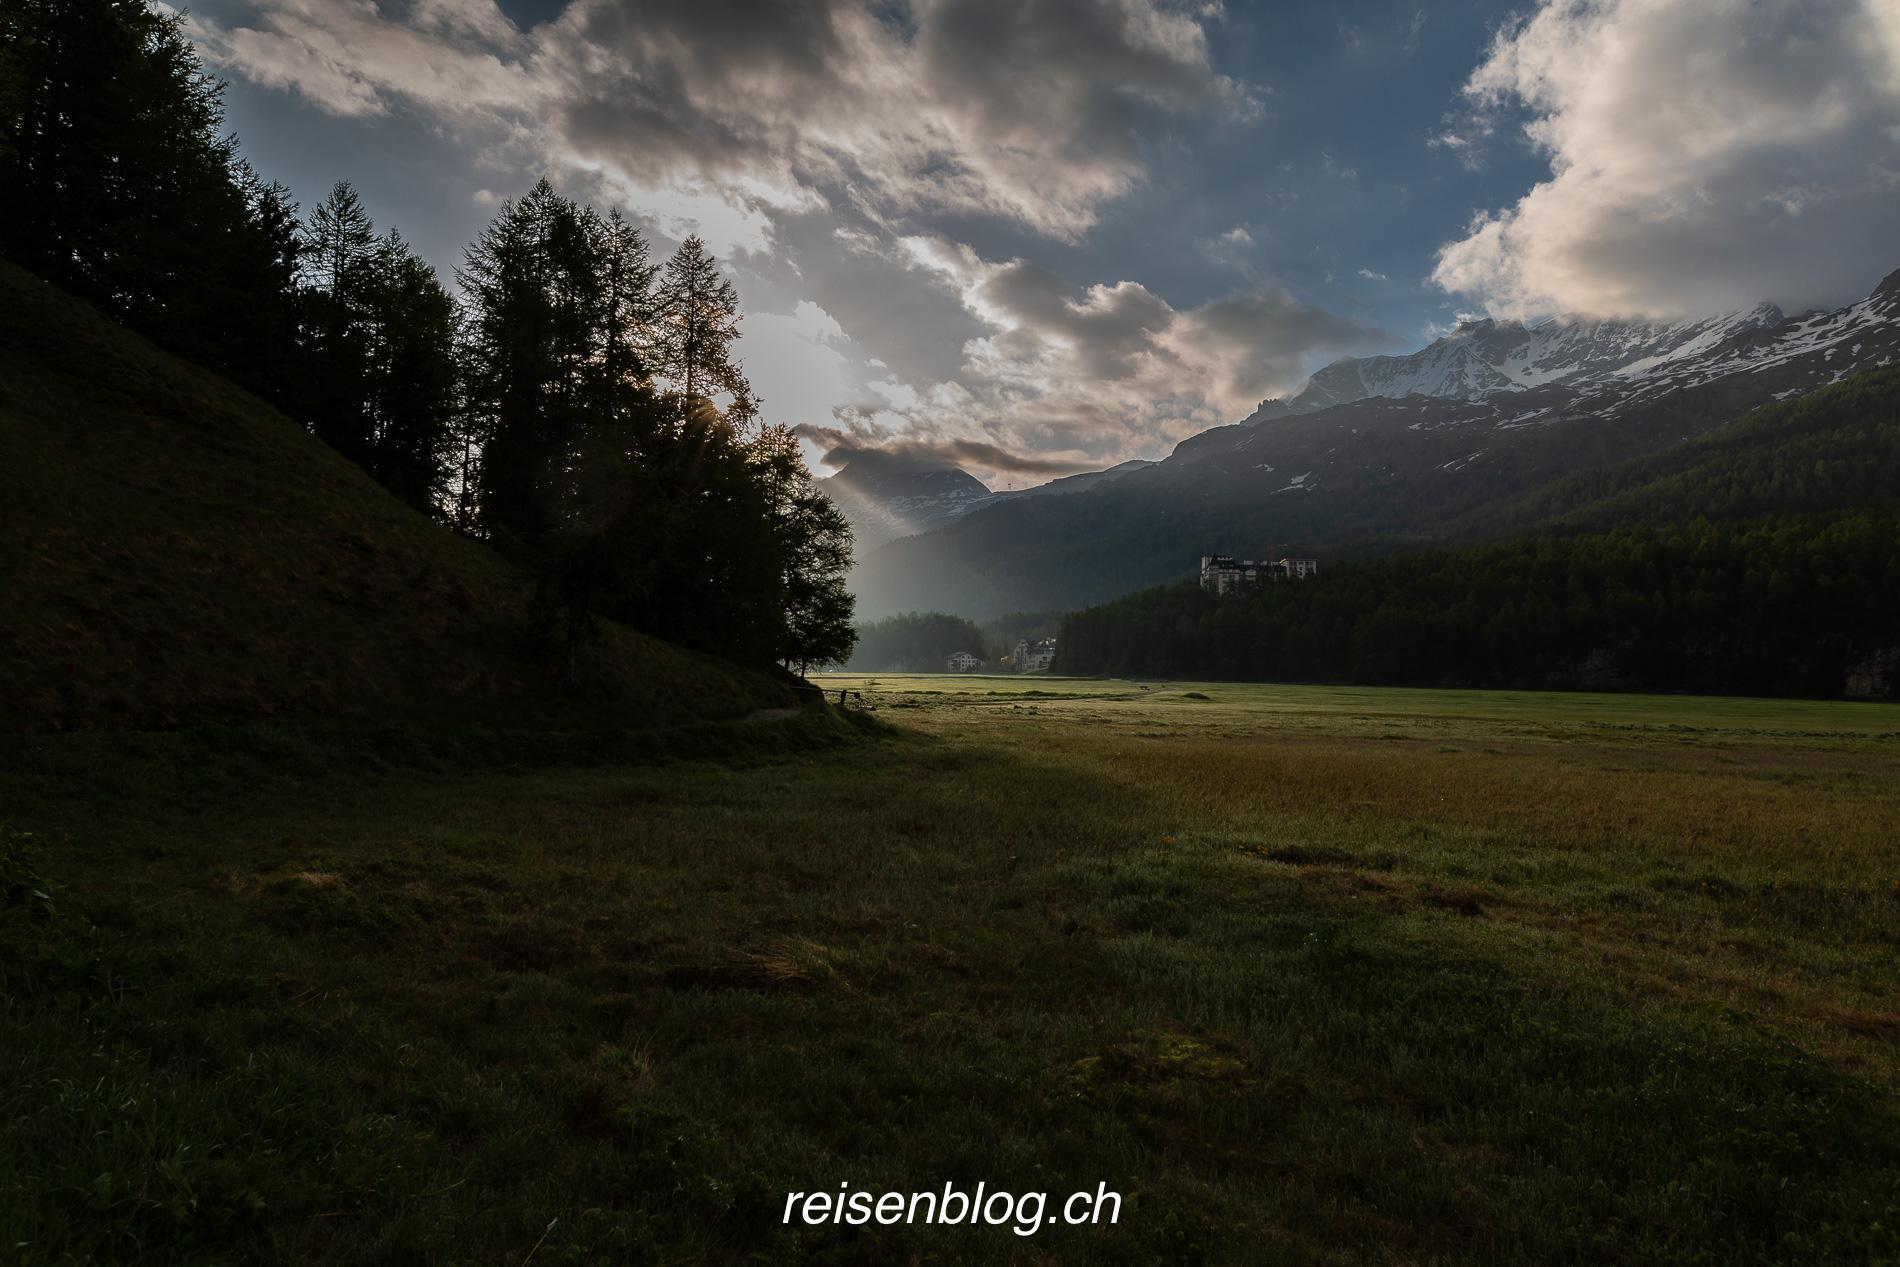 Reisenblog-2486